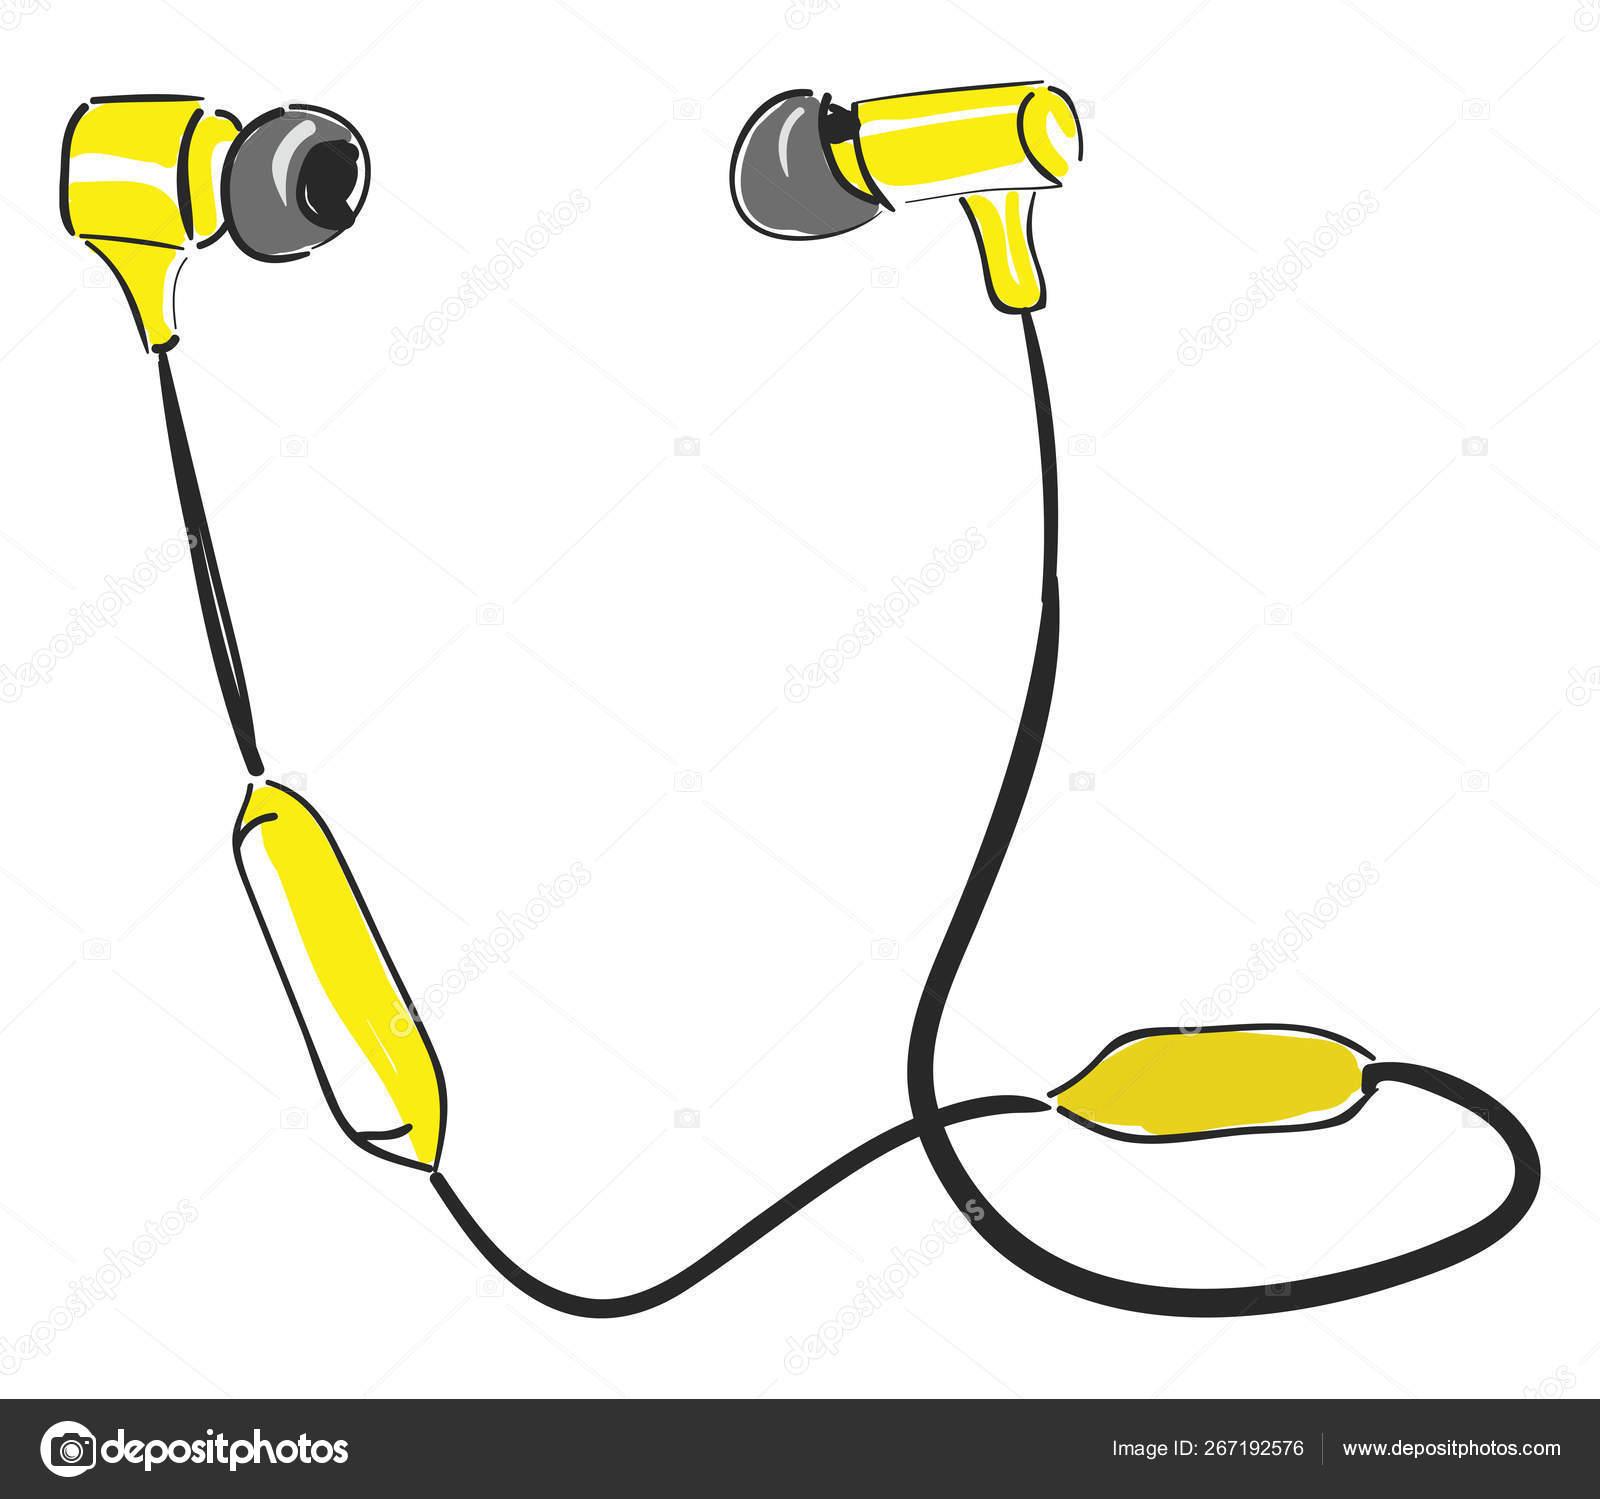 Bluetooth Earpiece Vector Or Color Illustration Stock Vector C Morphart 267192576